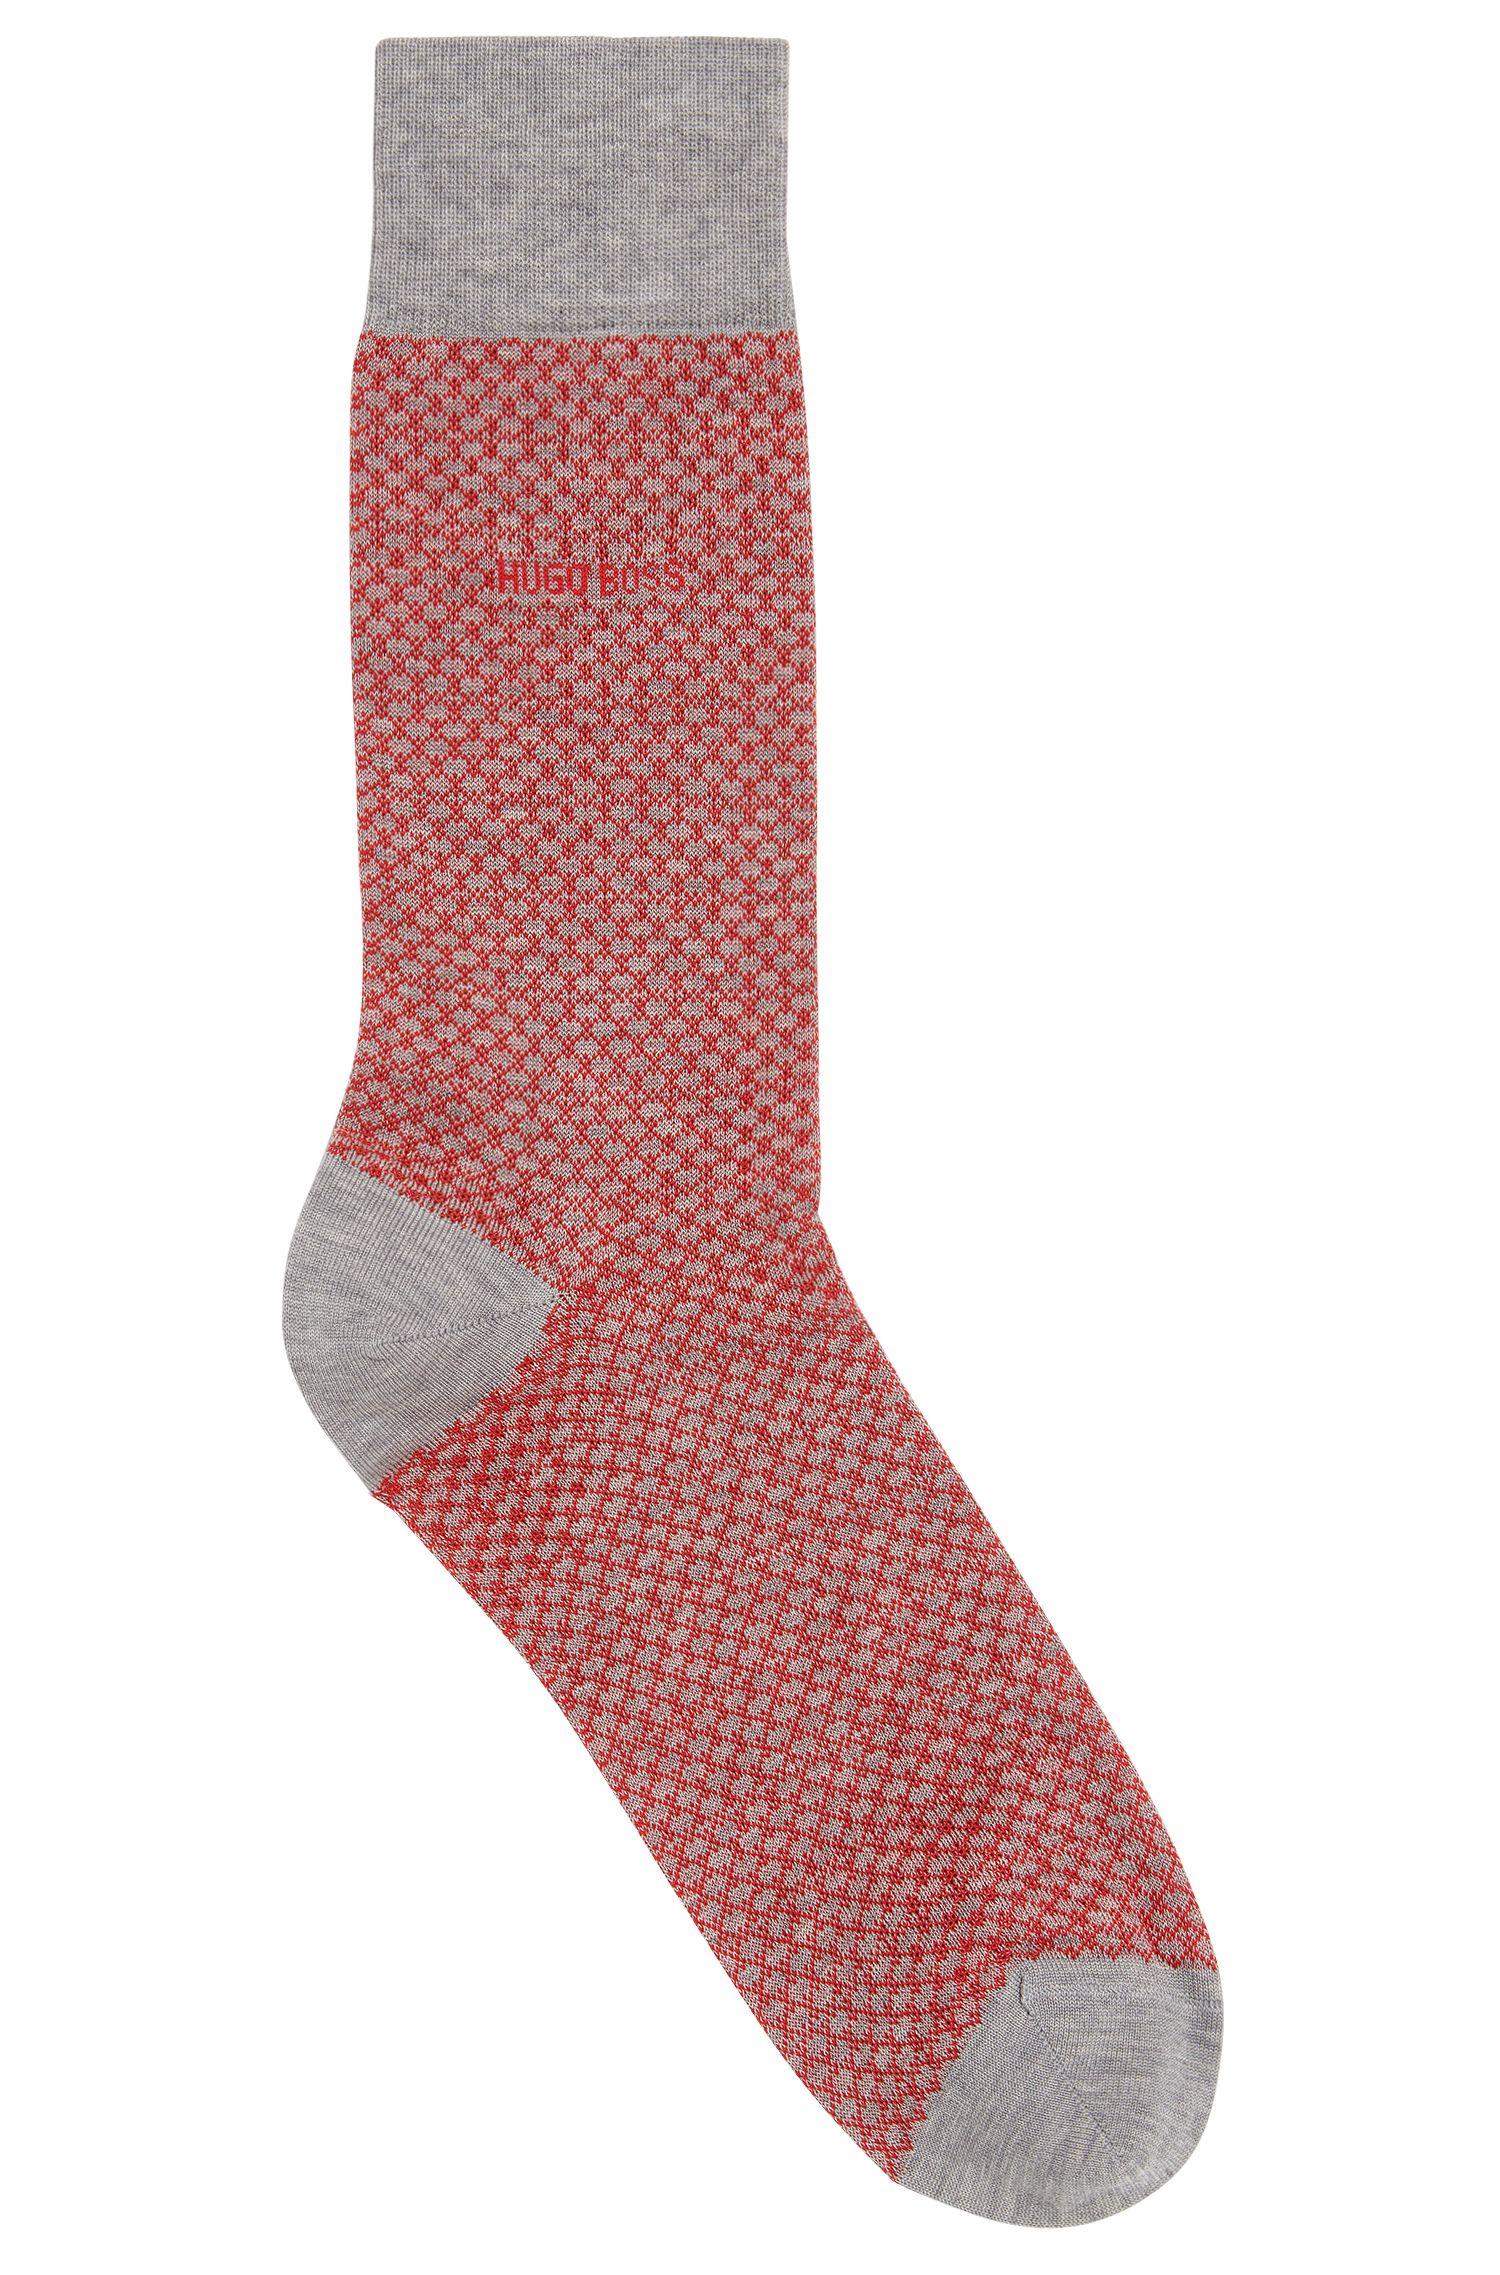 'RS Design US' | Polka-Dot Stretch Cotton Socks